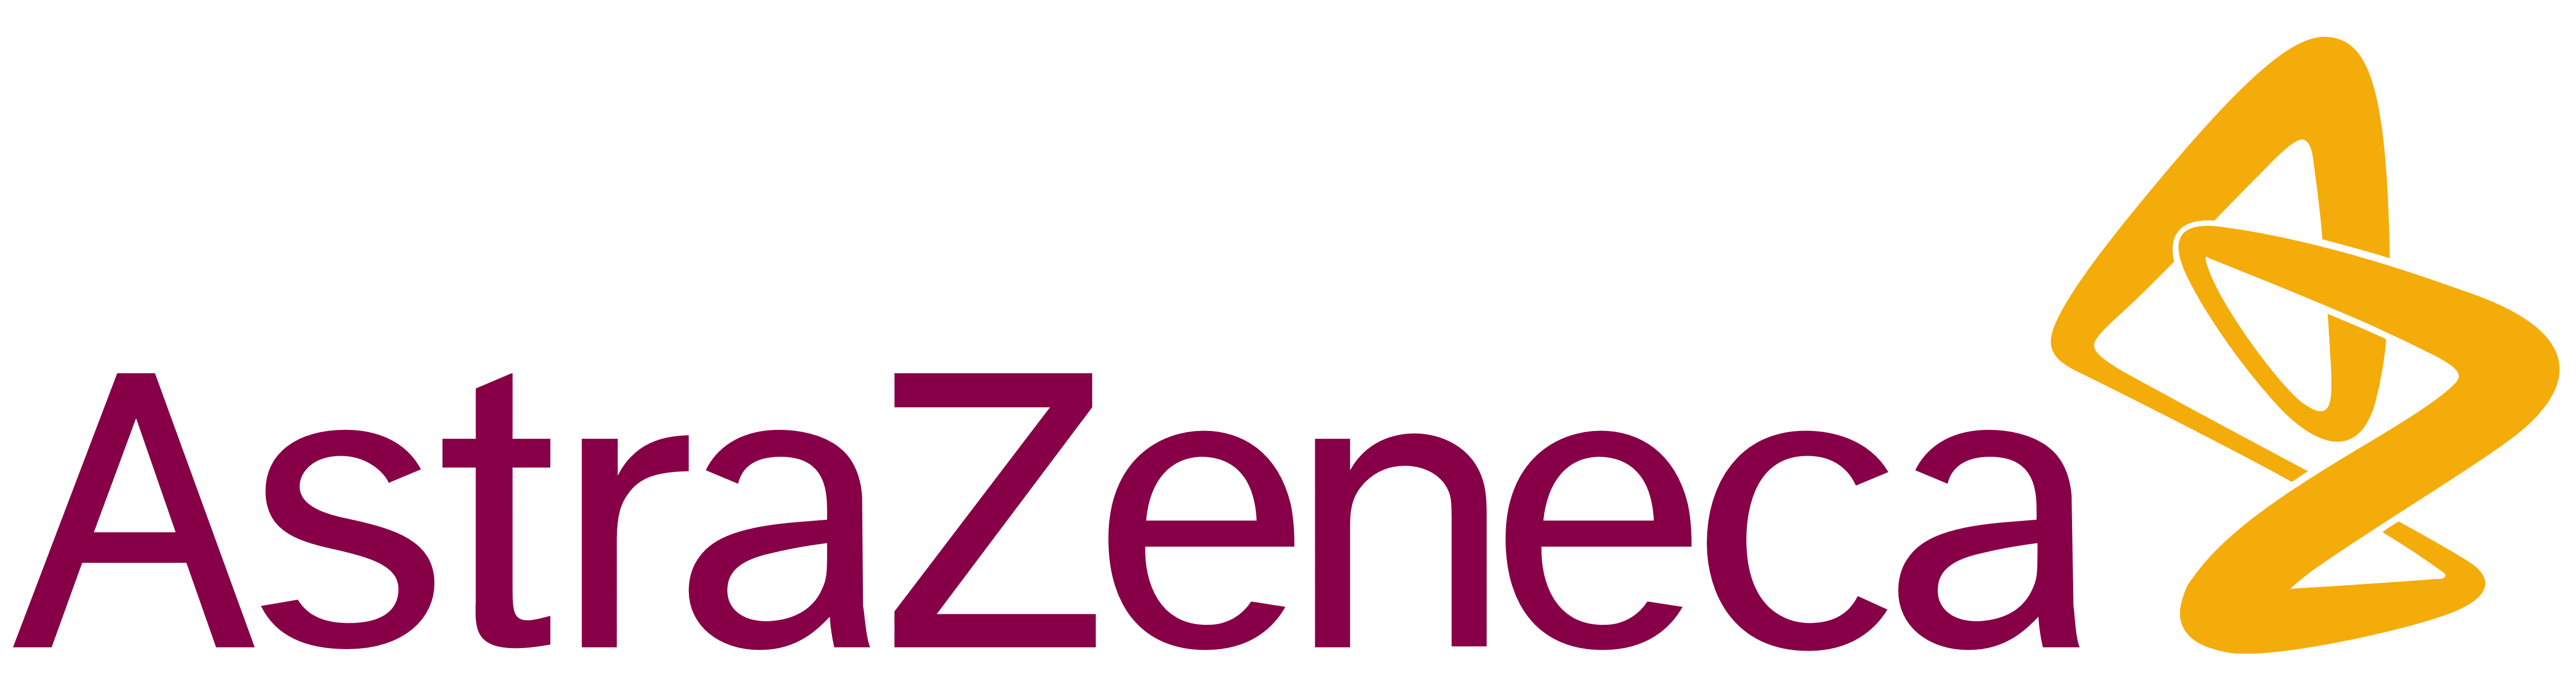 Astrazeneca Logo PNG-PlusPNG.